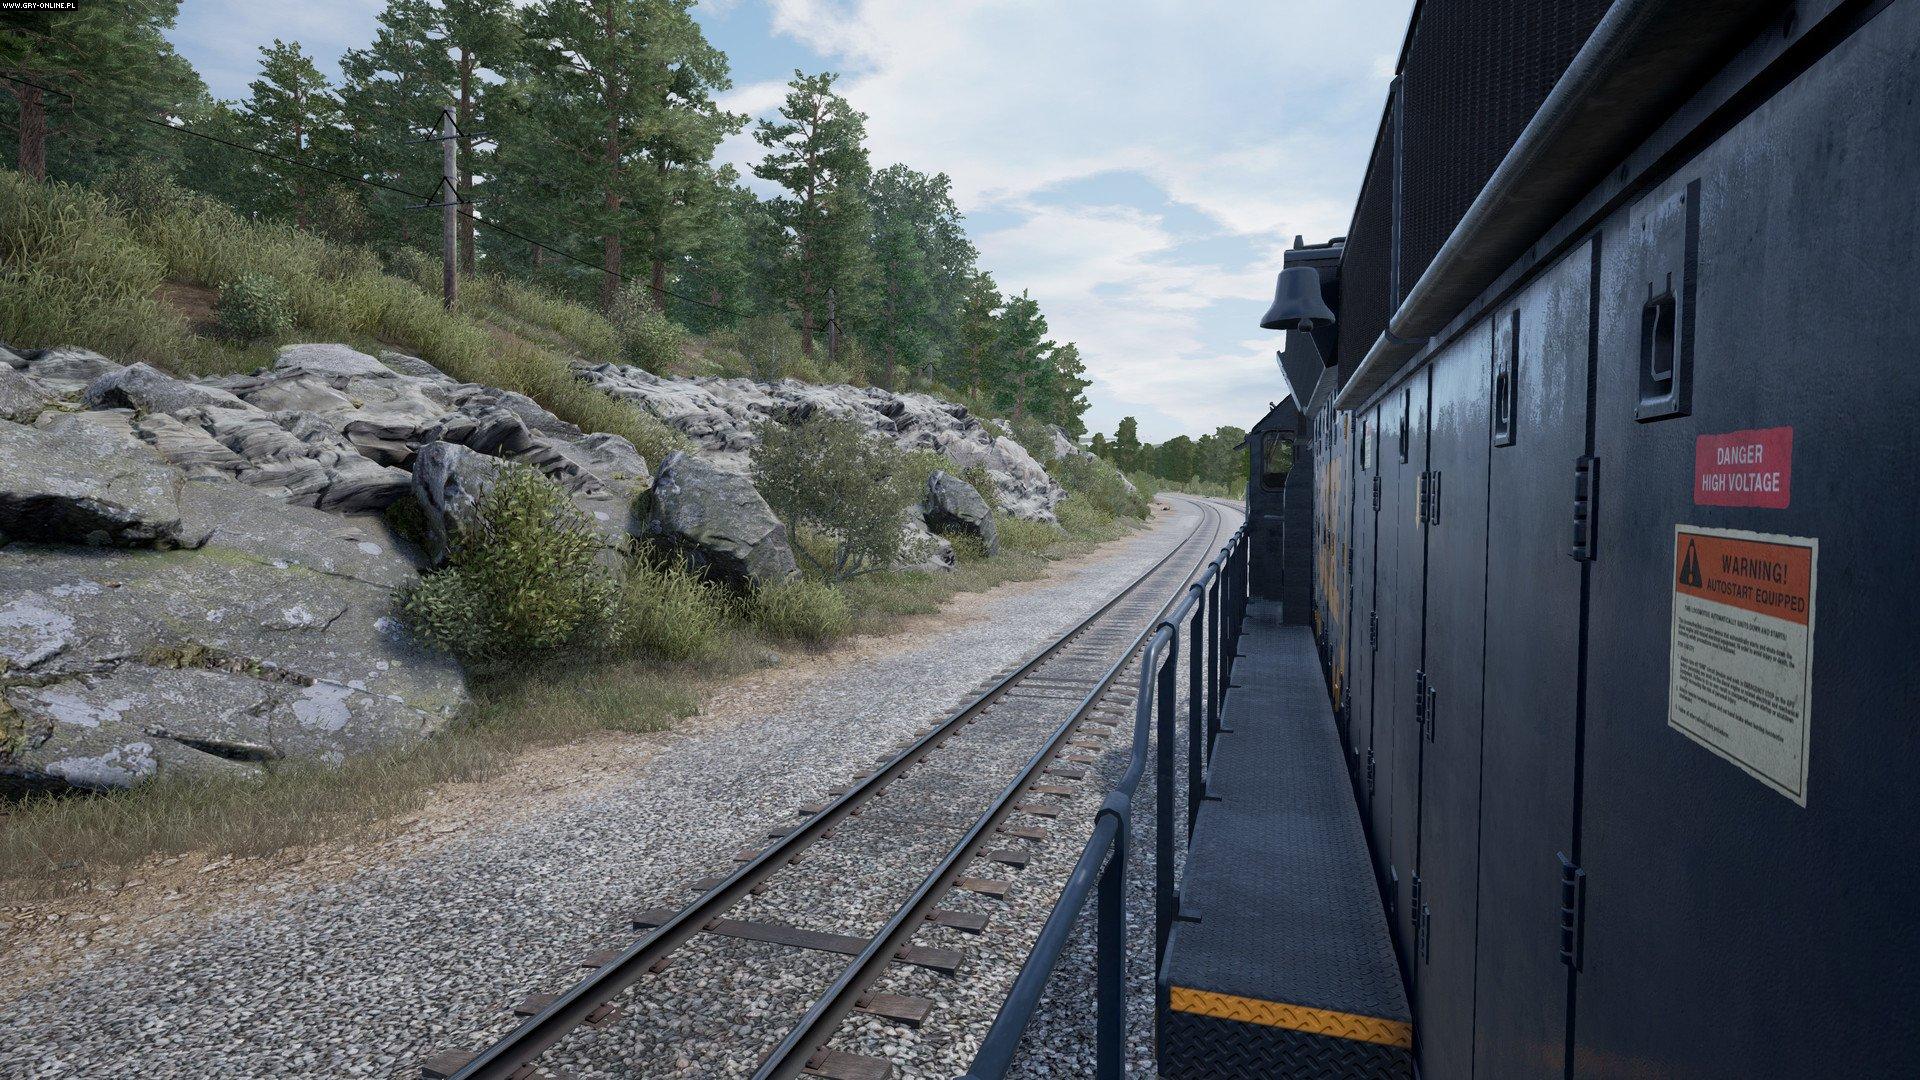 Train Sim World: CSX Heavy Haul PC, XONE Games Image 1/8, Dovetail Games/Rail Simulator Developments